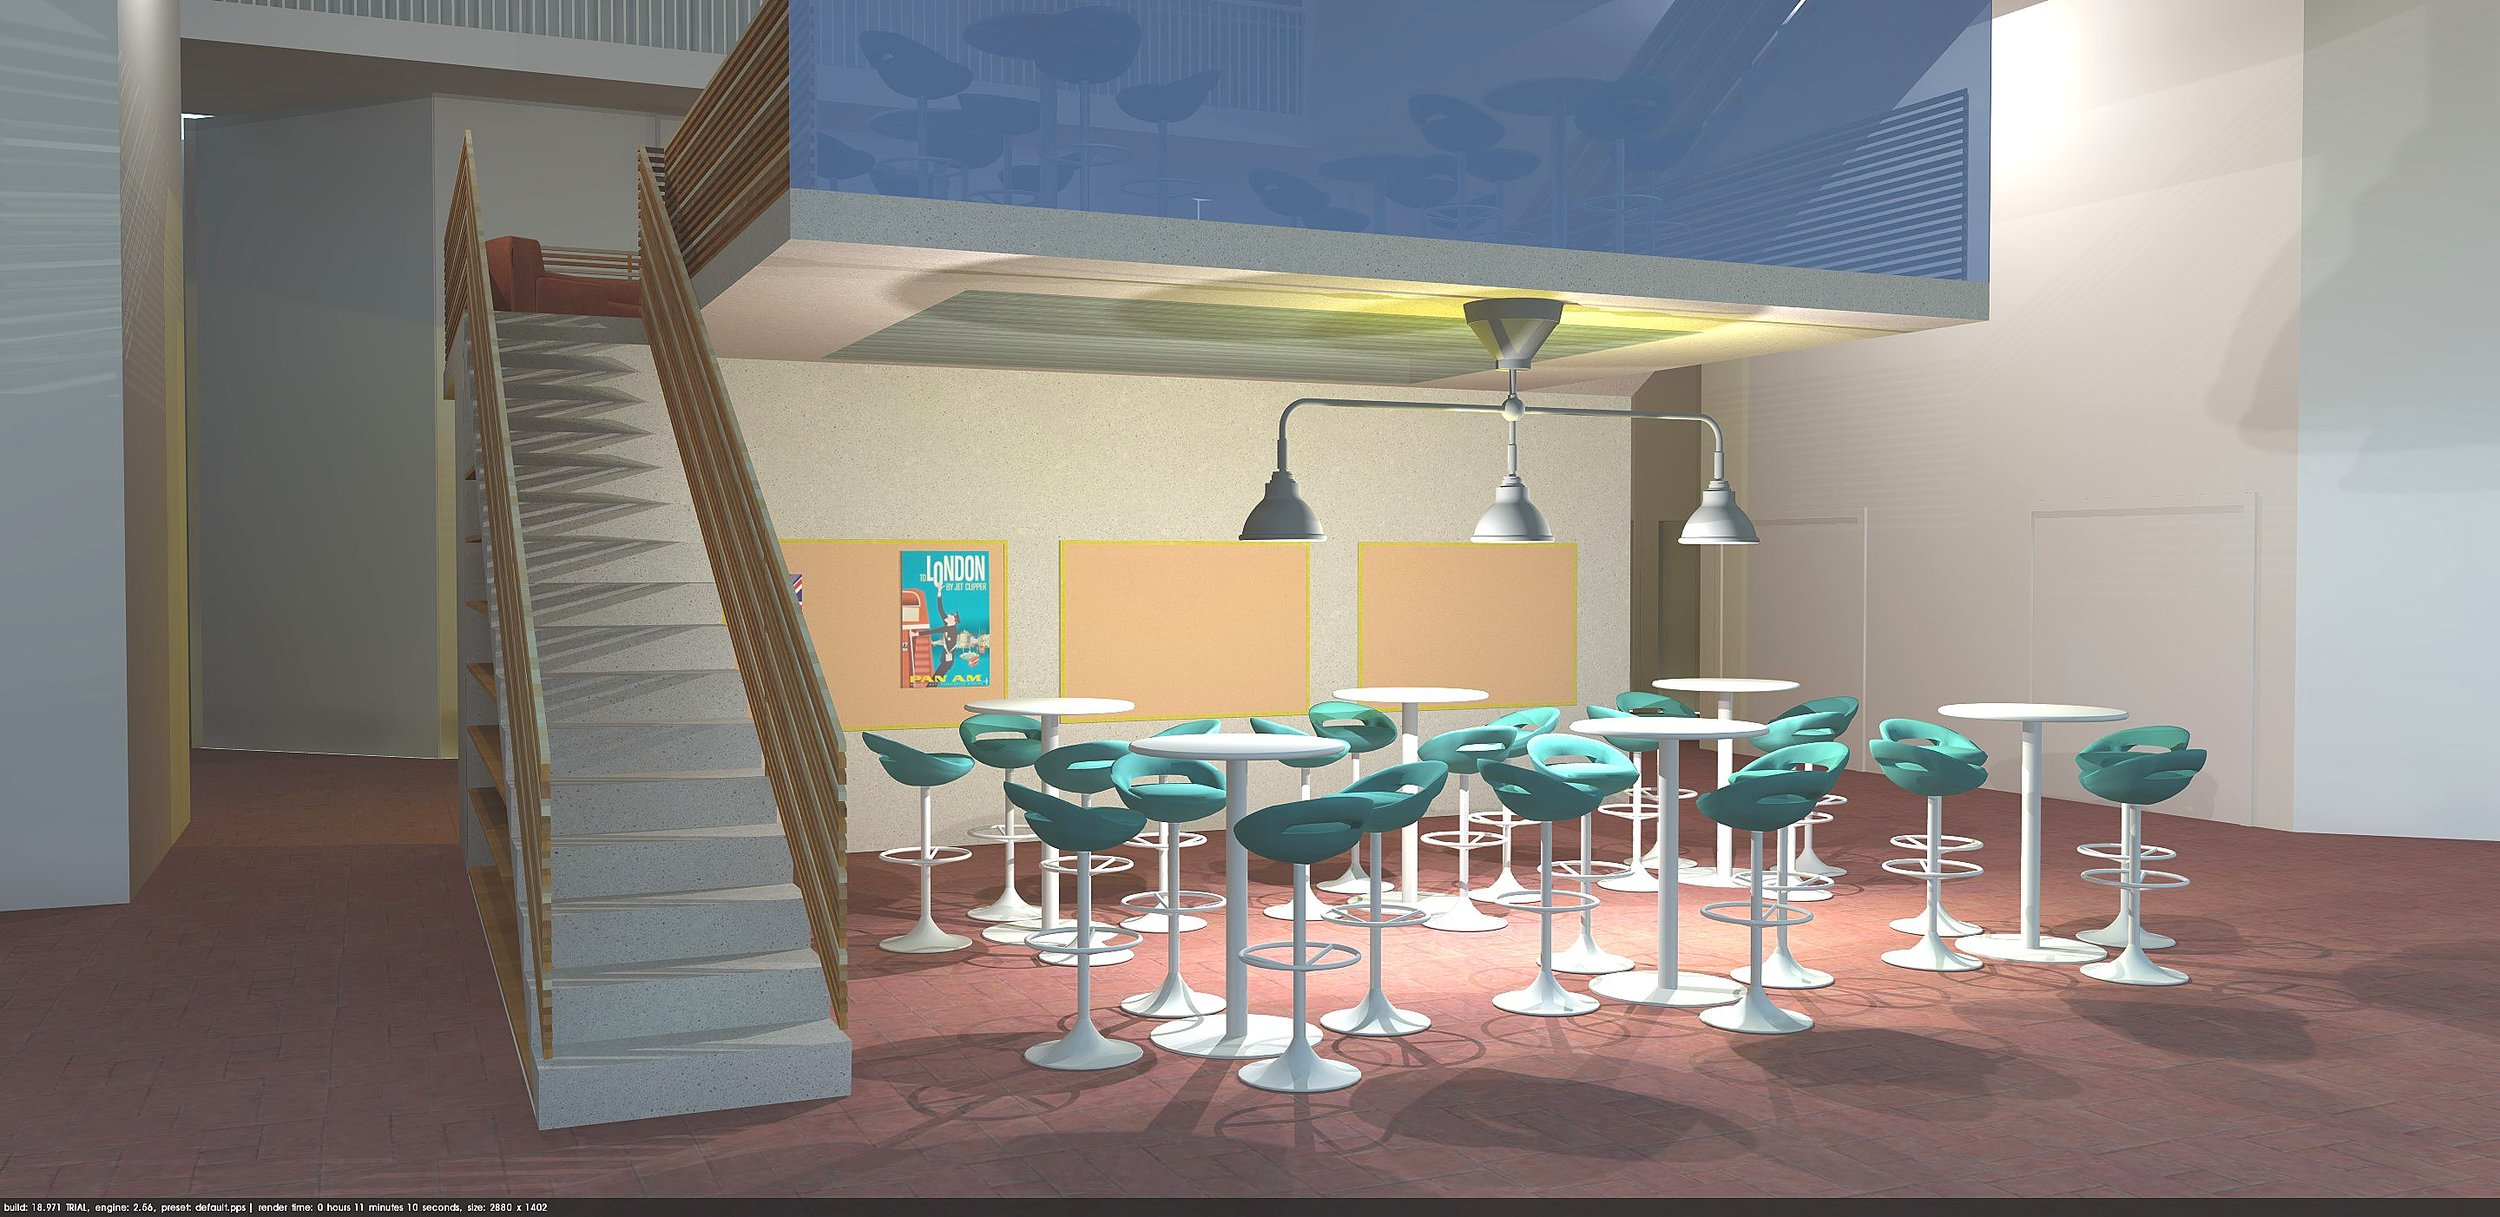 Atrium Stairs Perspective 1.jpg